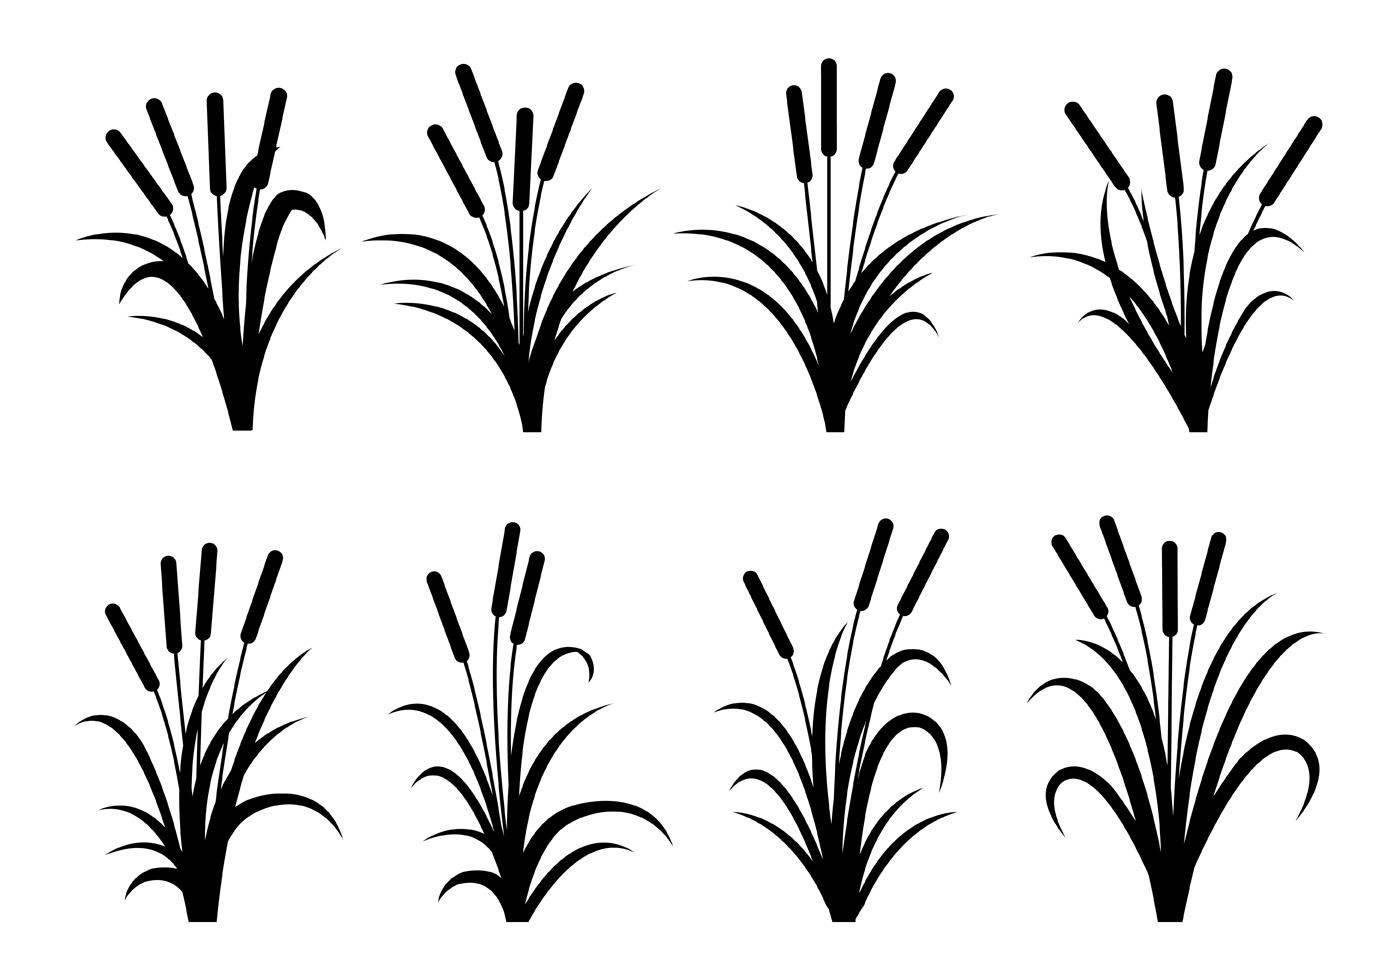 Cattails Silhouette Vectors